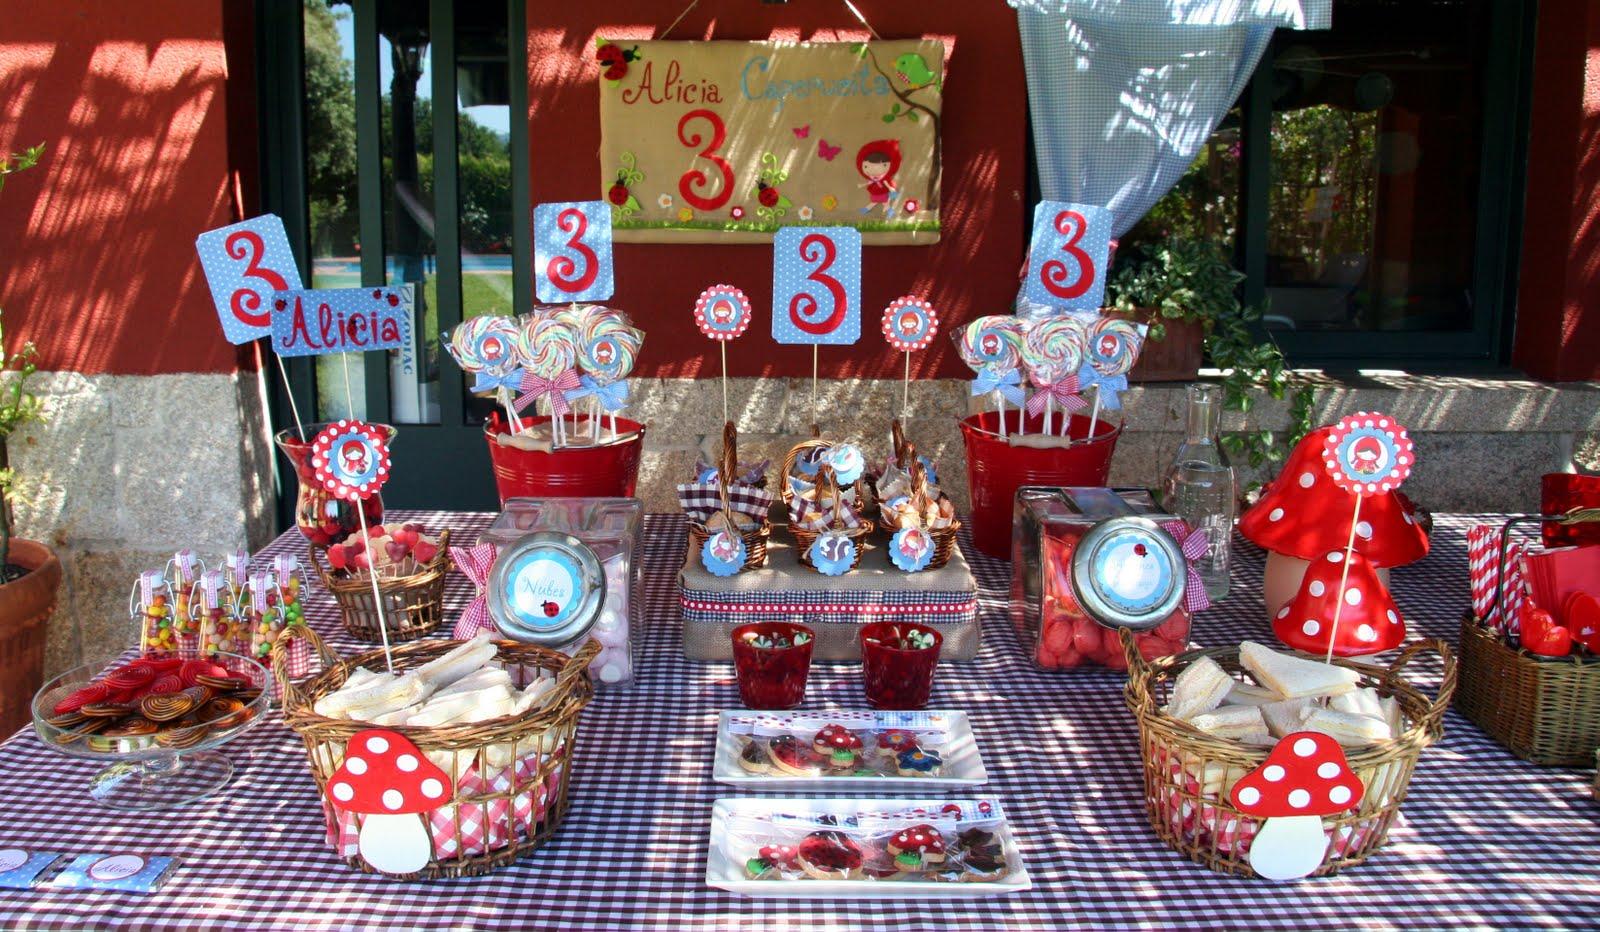 Decoration42 decoracion mesa cumplea os - Menu para fiesta de cumpleanos en casa ...